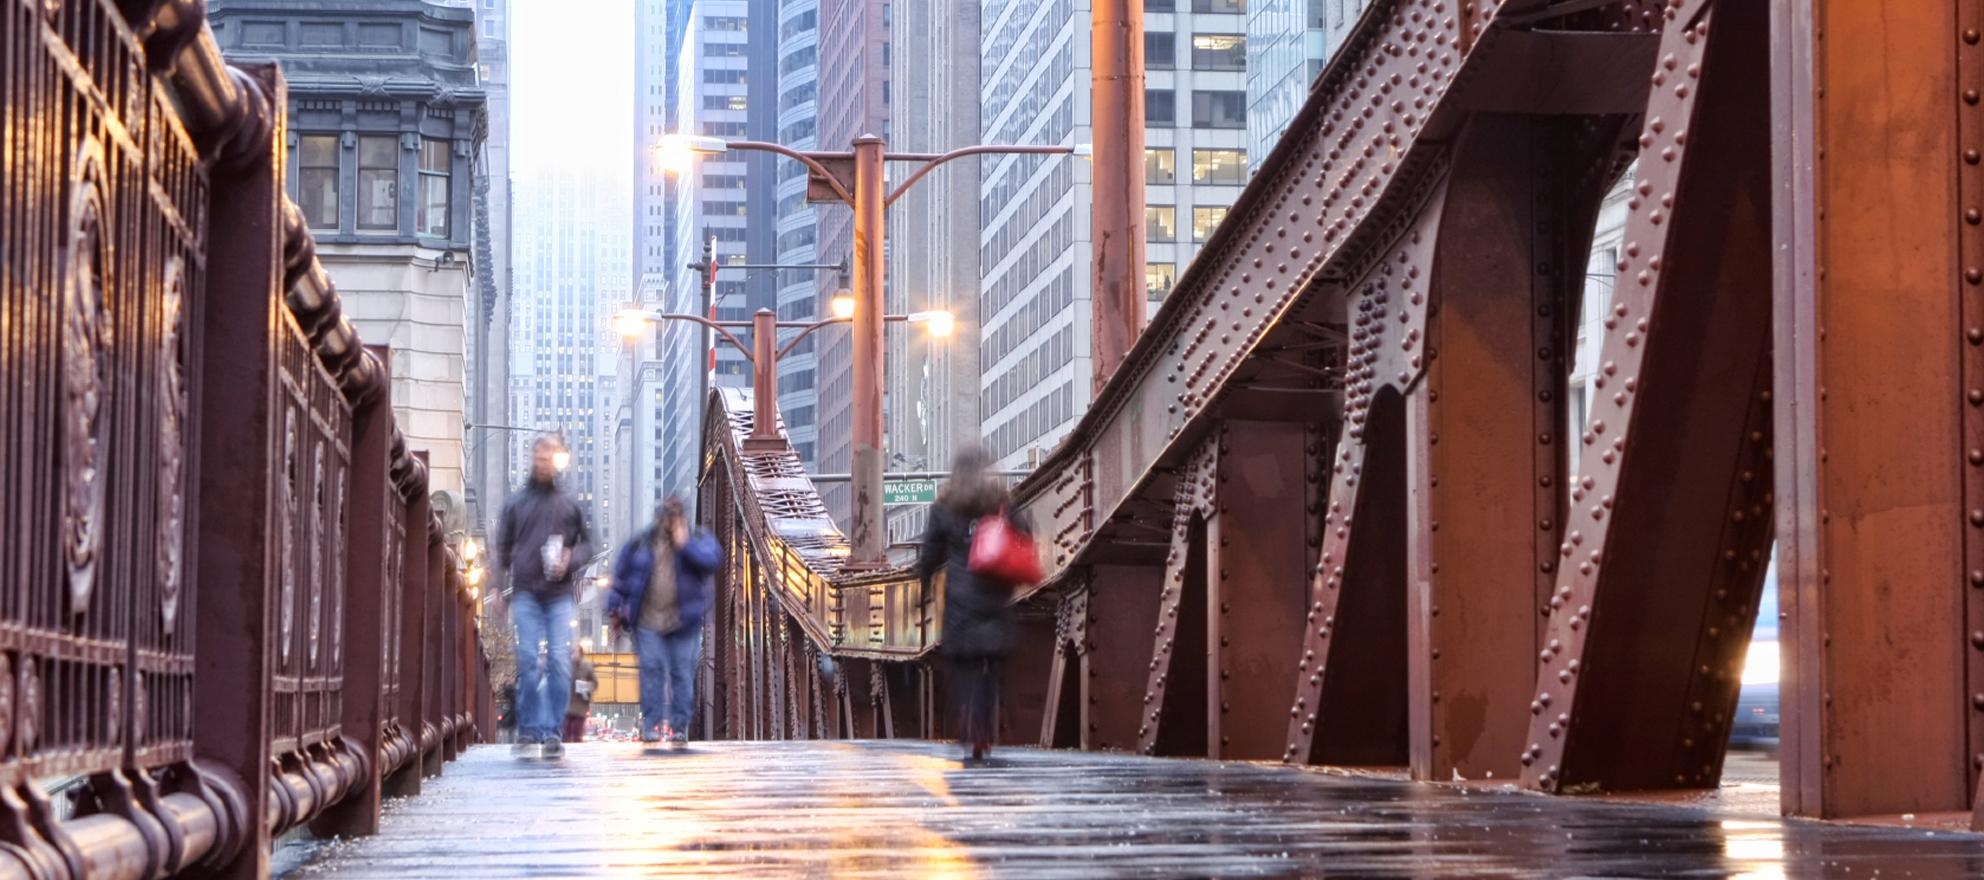 Rentership breaks records in 10 year period-- almost half are cost-burden